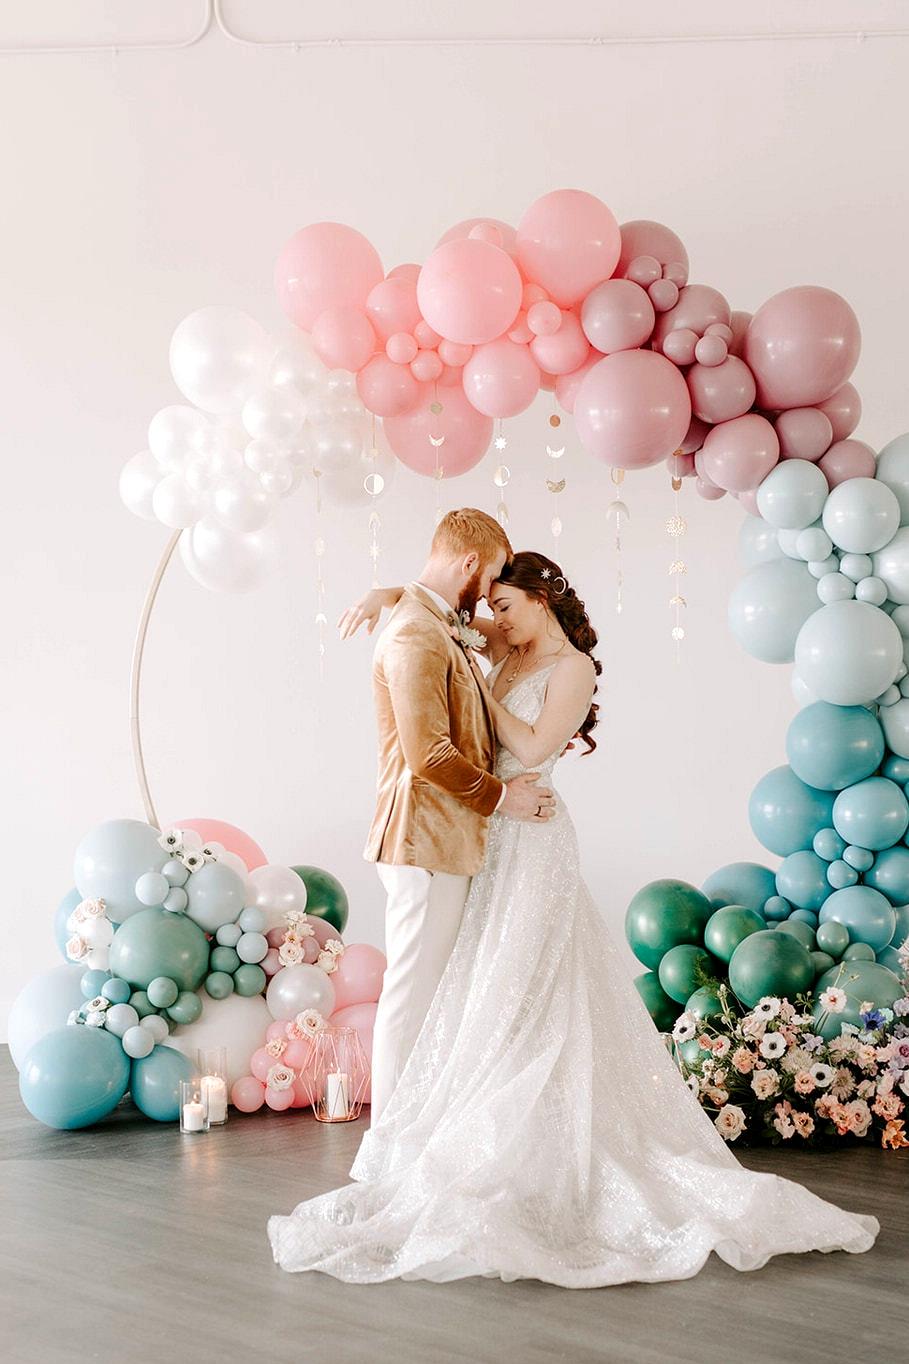 Balloon ceremony backdrop |